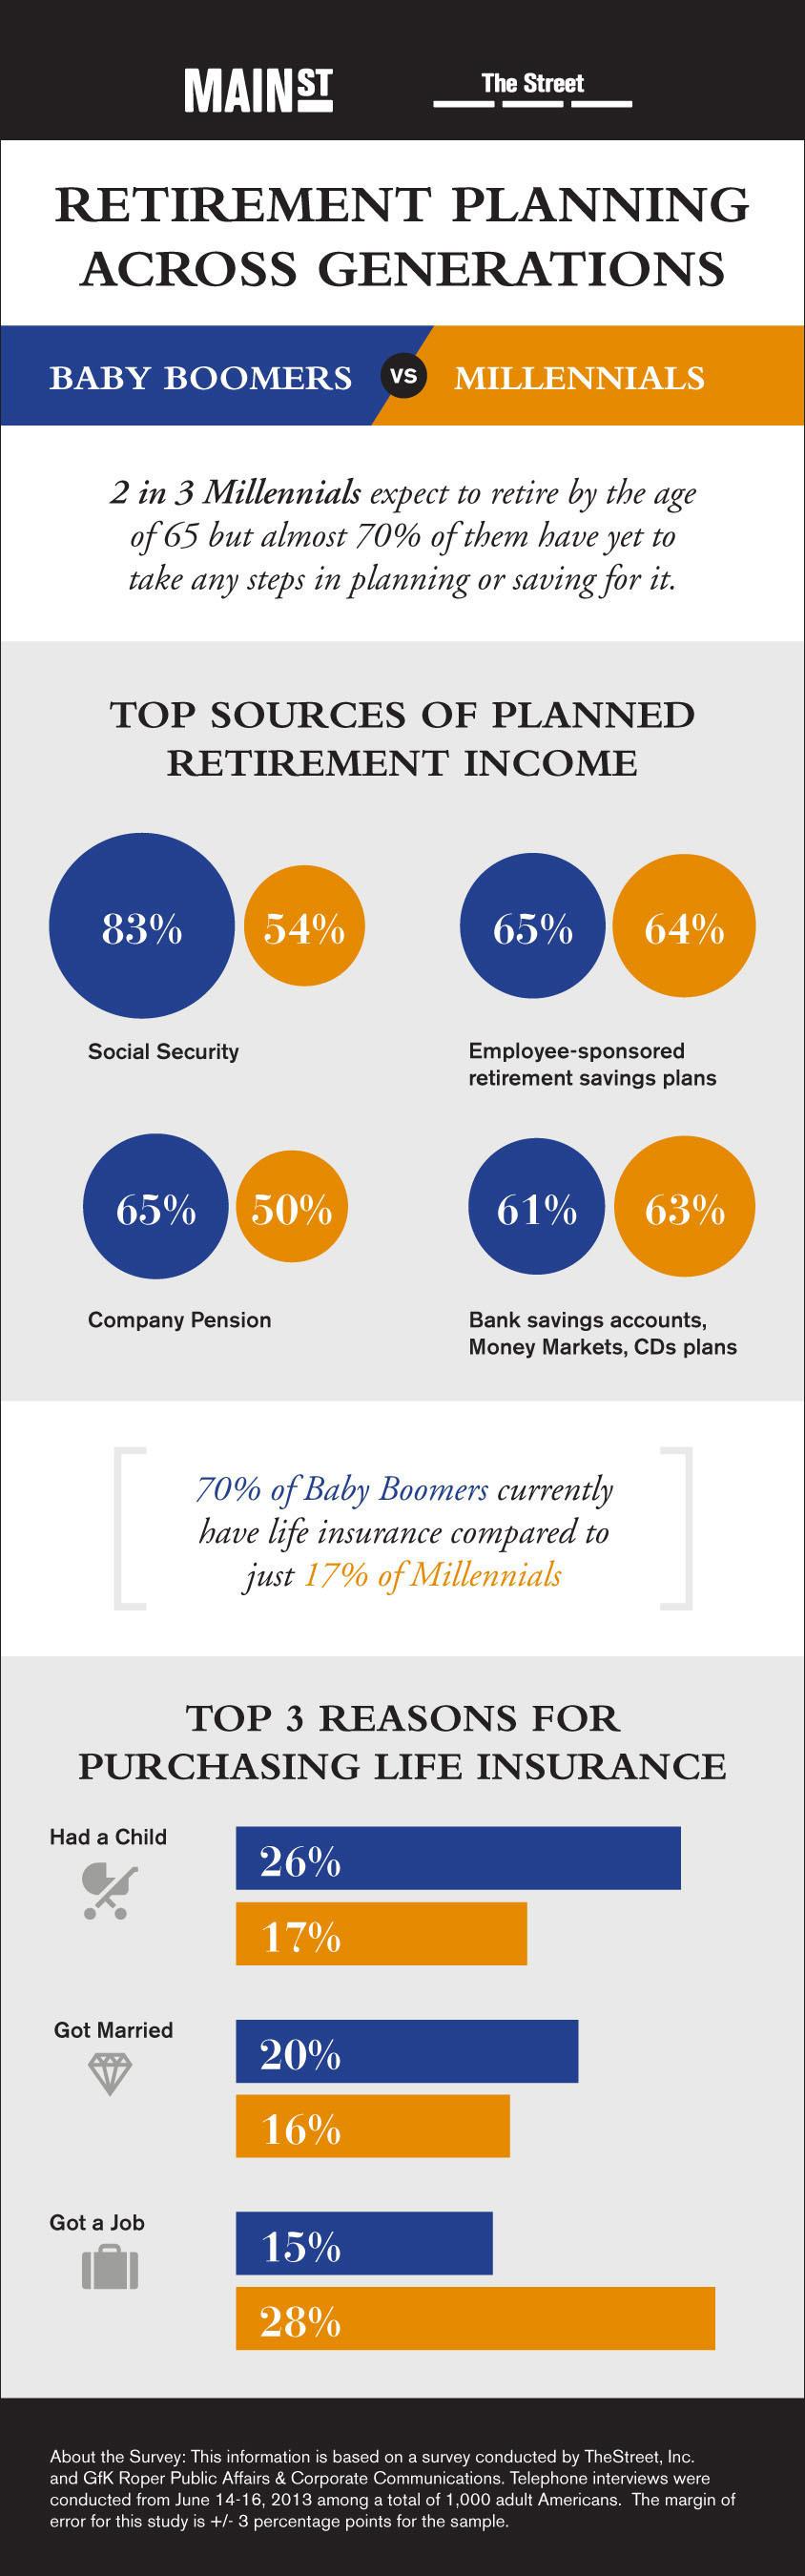 Retirement Planning Millennials vs. Baby Boomers.  (PRNewsFoto/TheStreet, Inc.)